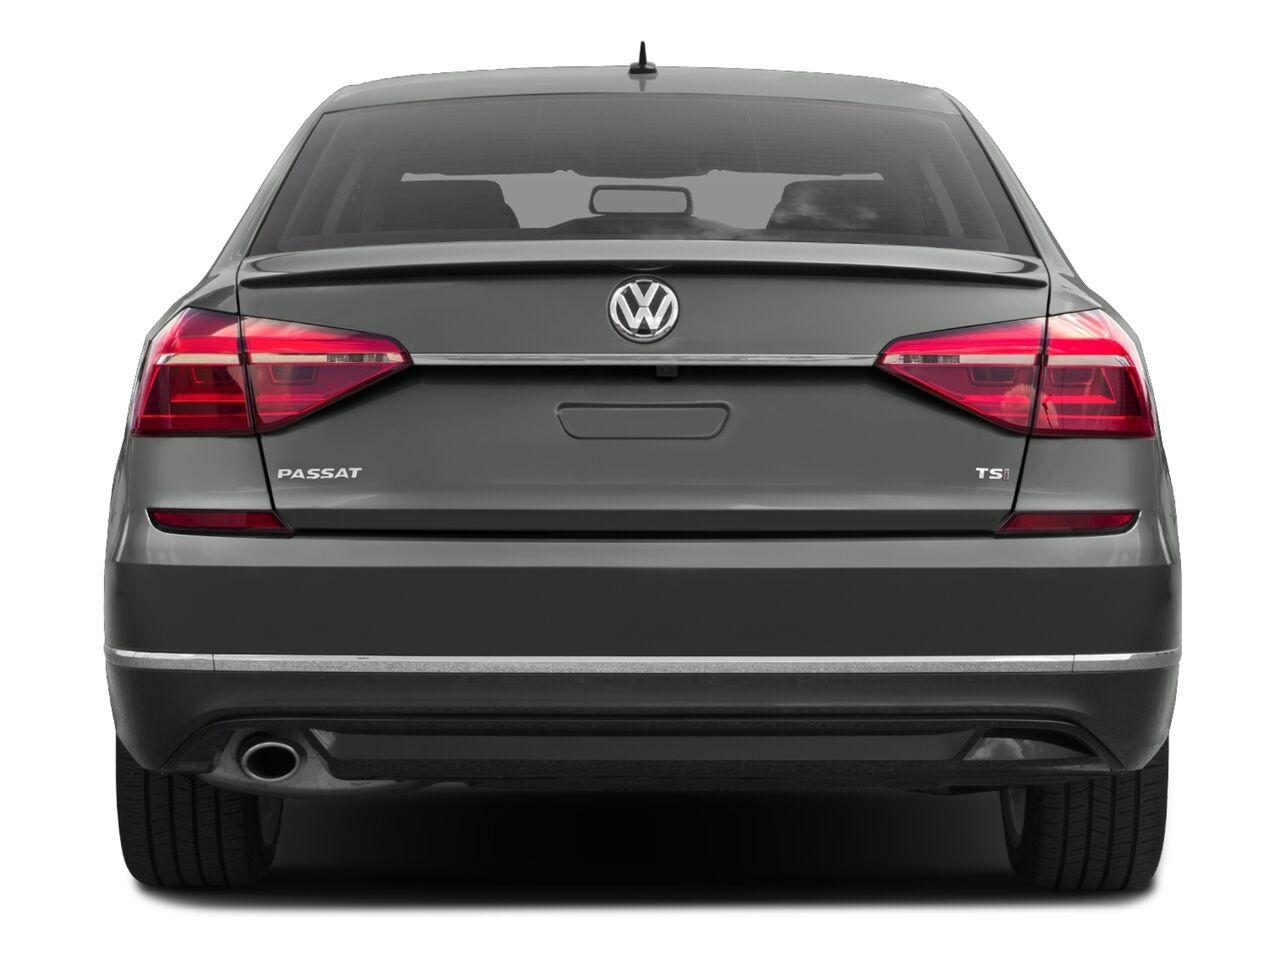 2017 Volkswagen Passat 1.8T R-Line Houston TX